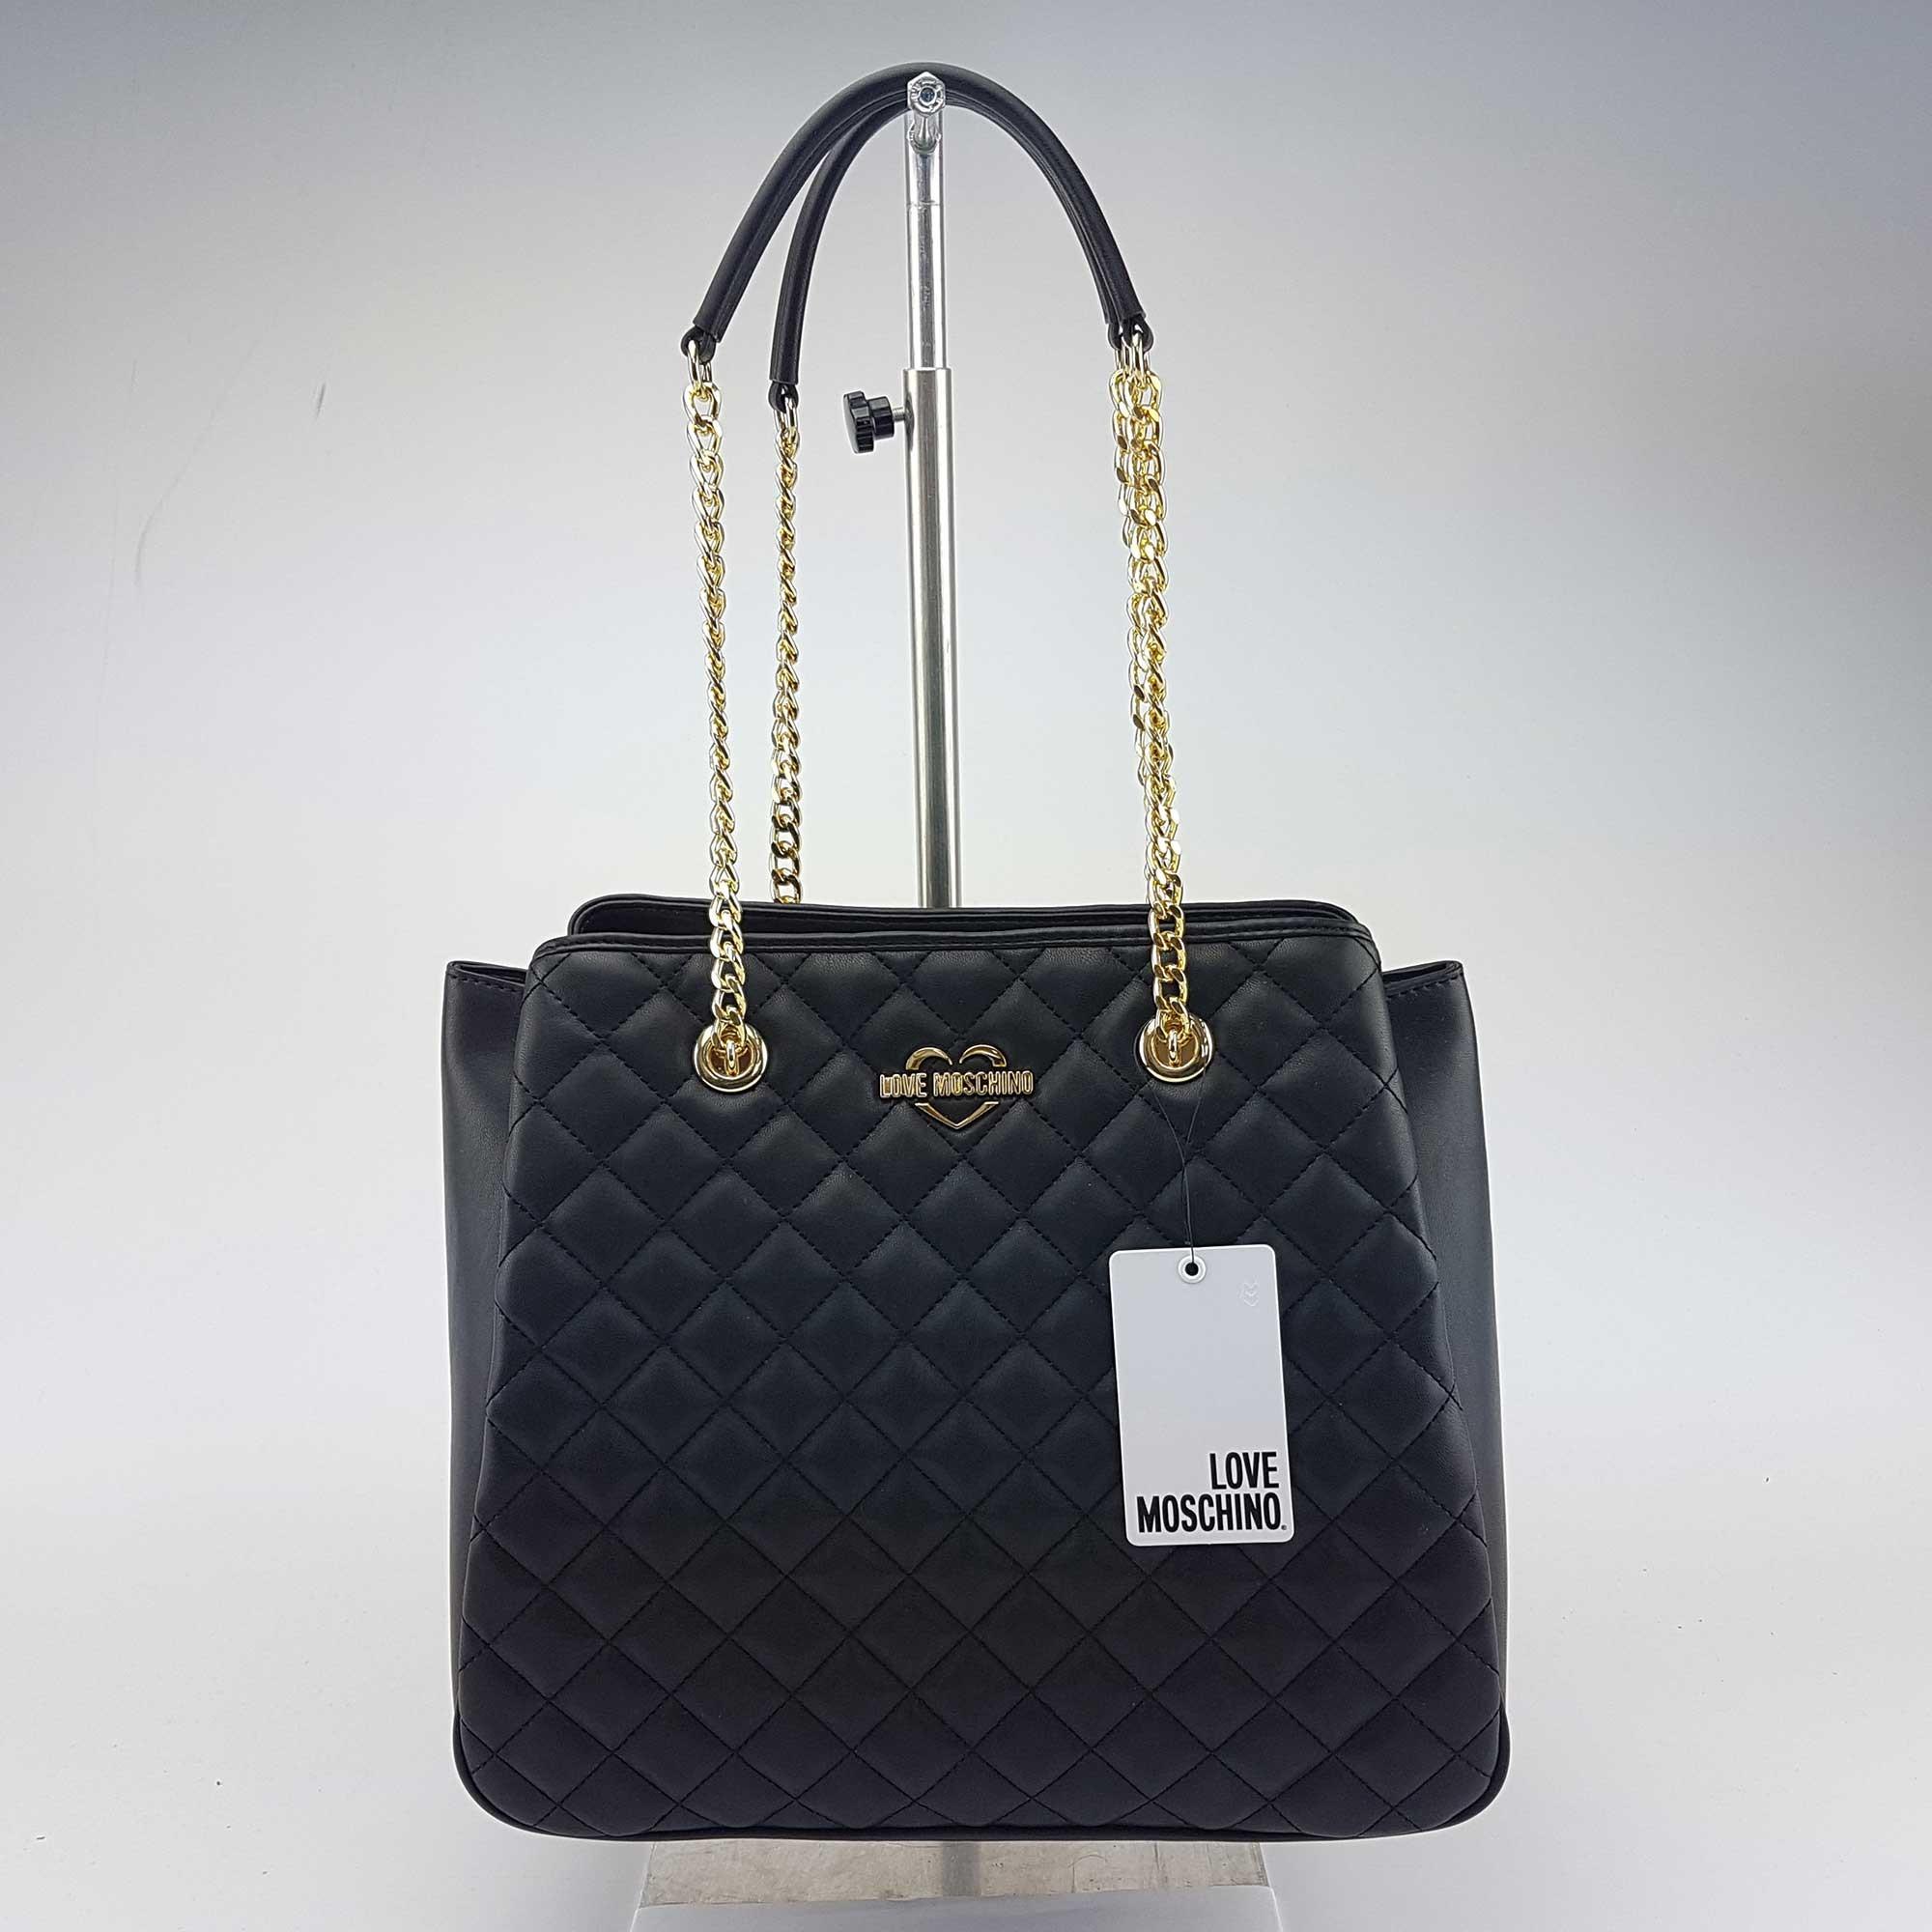 Borsa shopping Love Moschino trapuntata nera 60b30cc809a